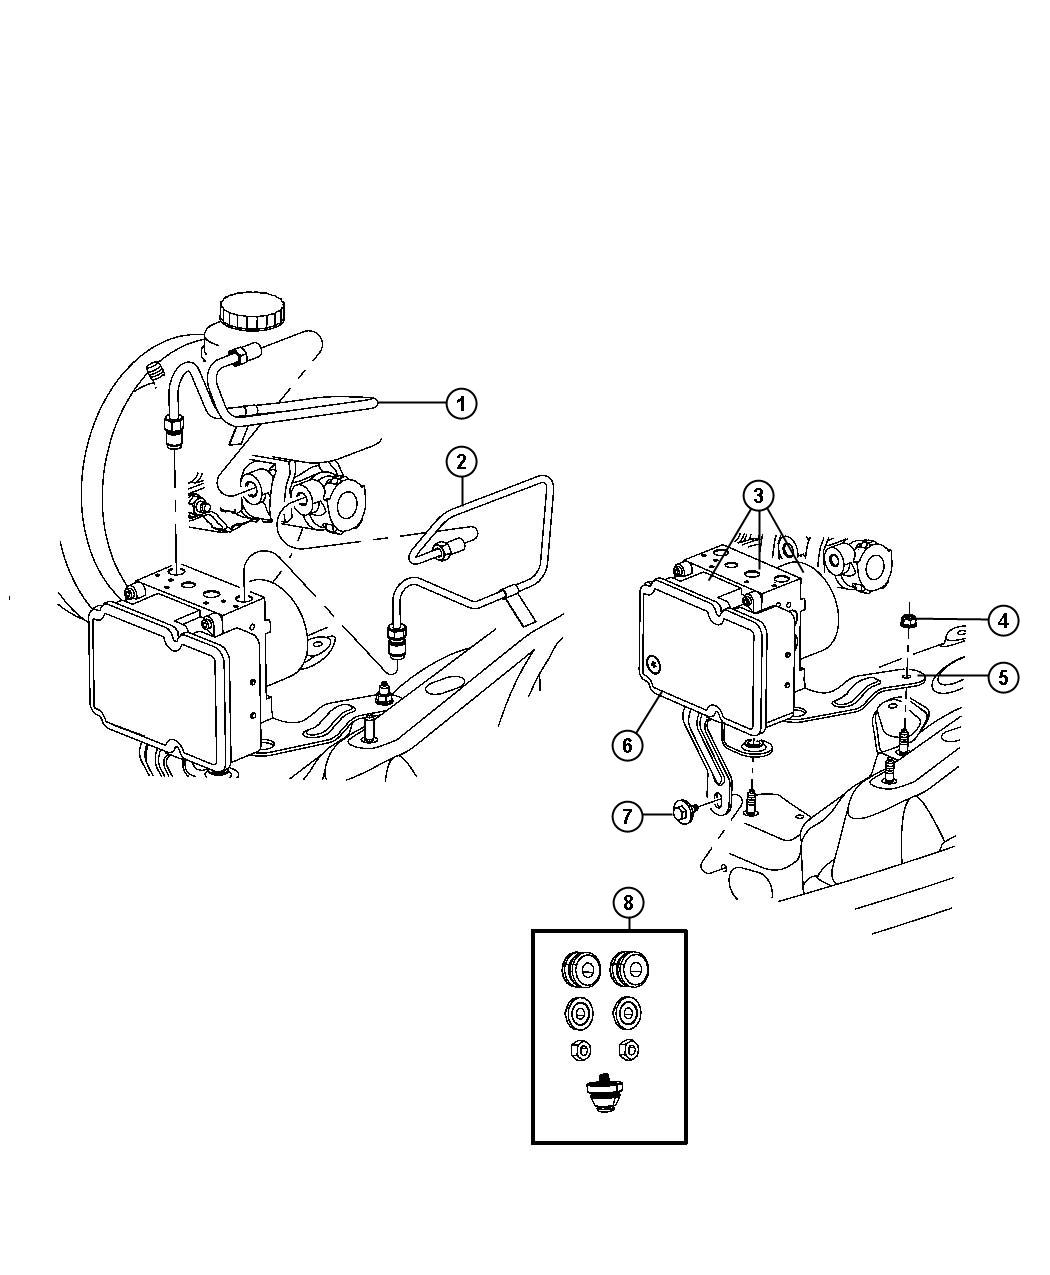 Jeep Liberty Module. Anti-lock brake system. Tubes